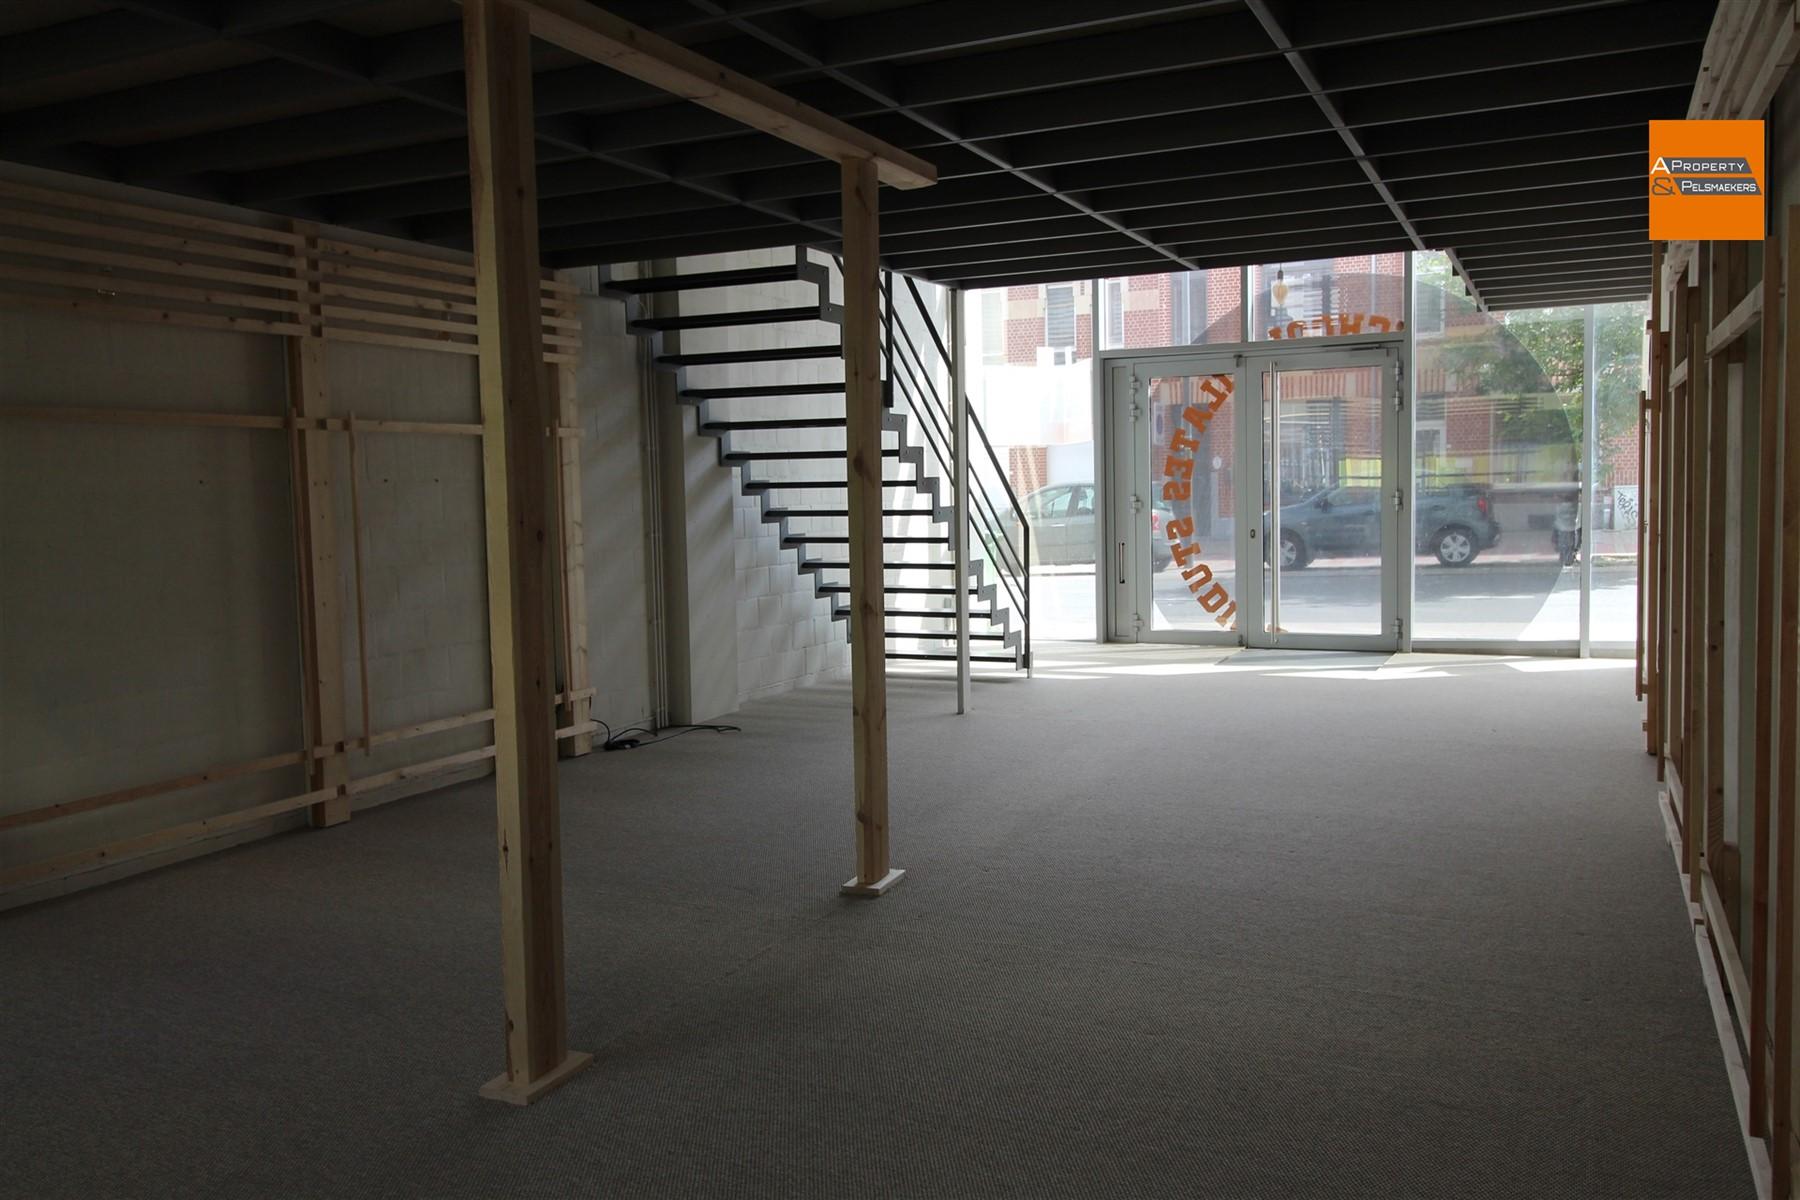 Foto 3 : Winkelruimte in 3010 KESSEL LO (België) - Prijs € 1.750